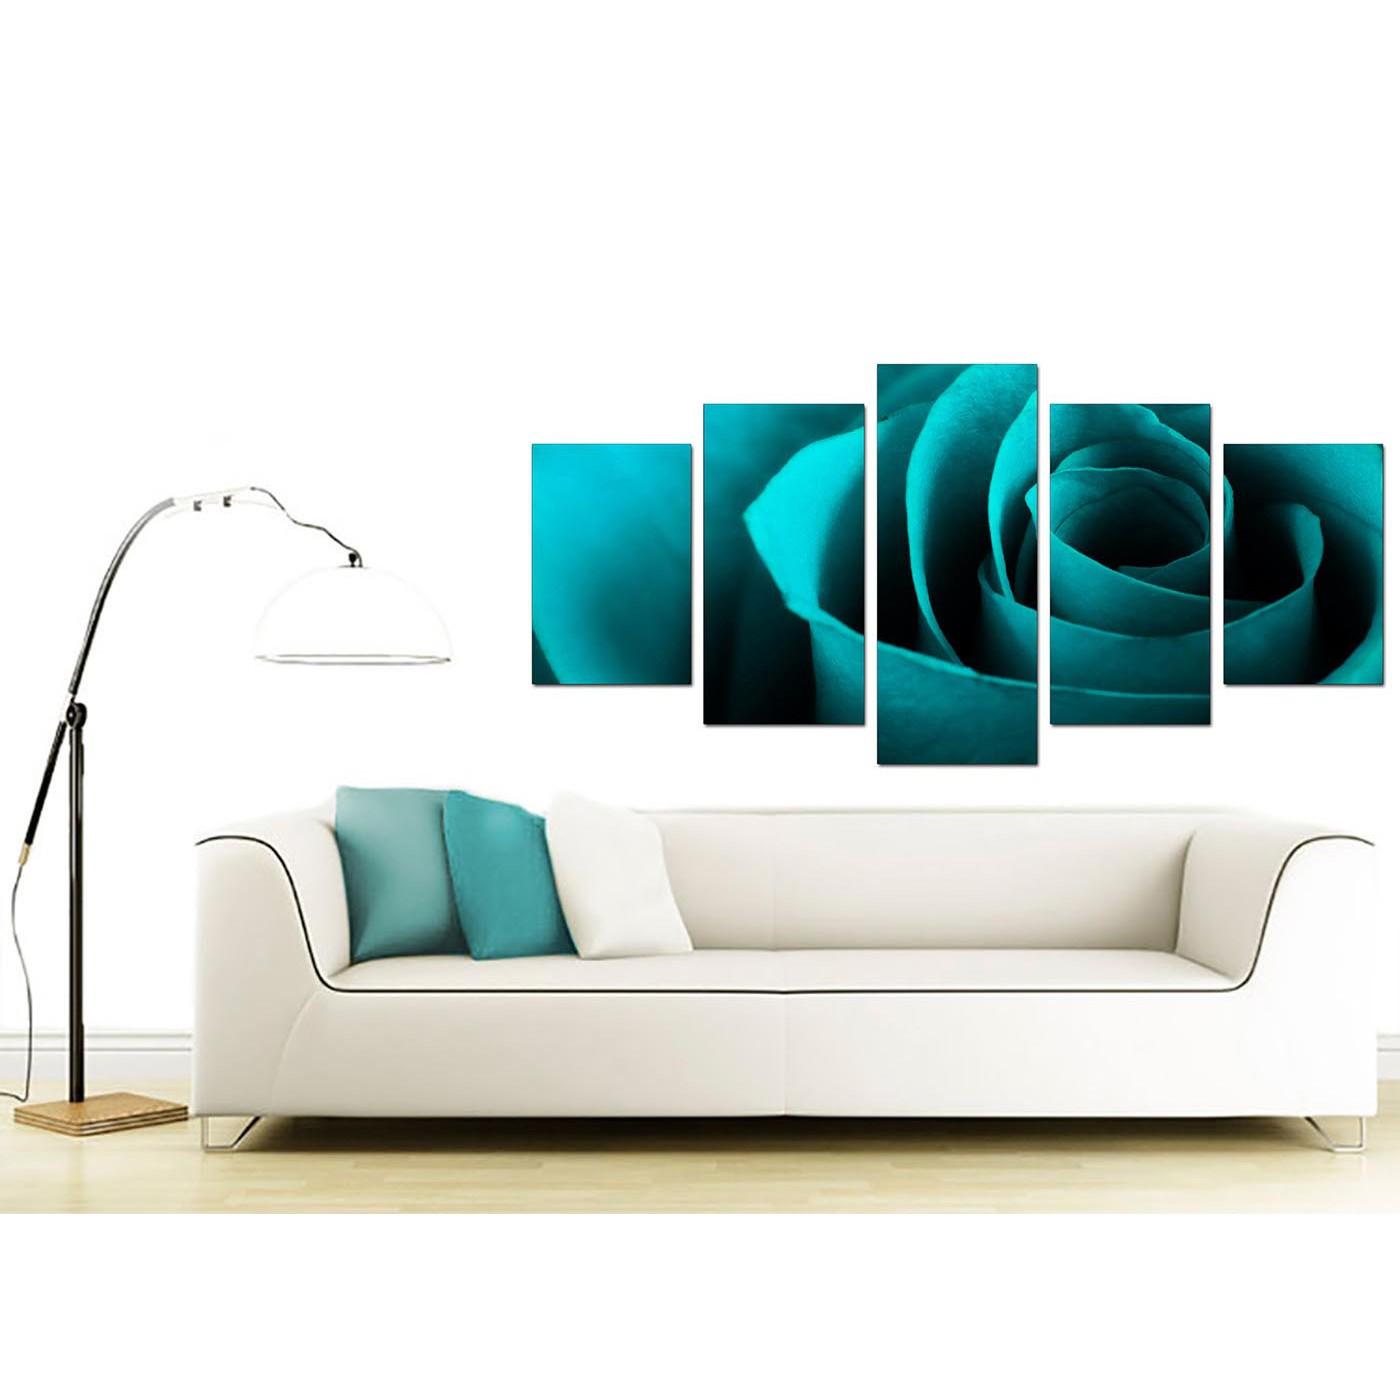 Display Gallery Item 3; Back Display Gallery Item 4 ...